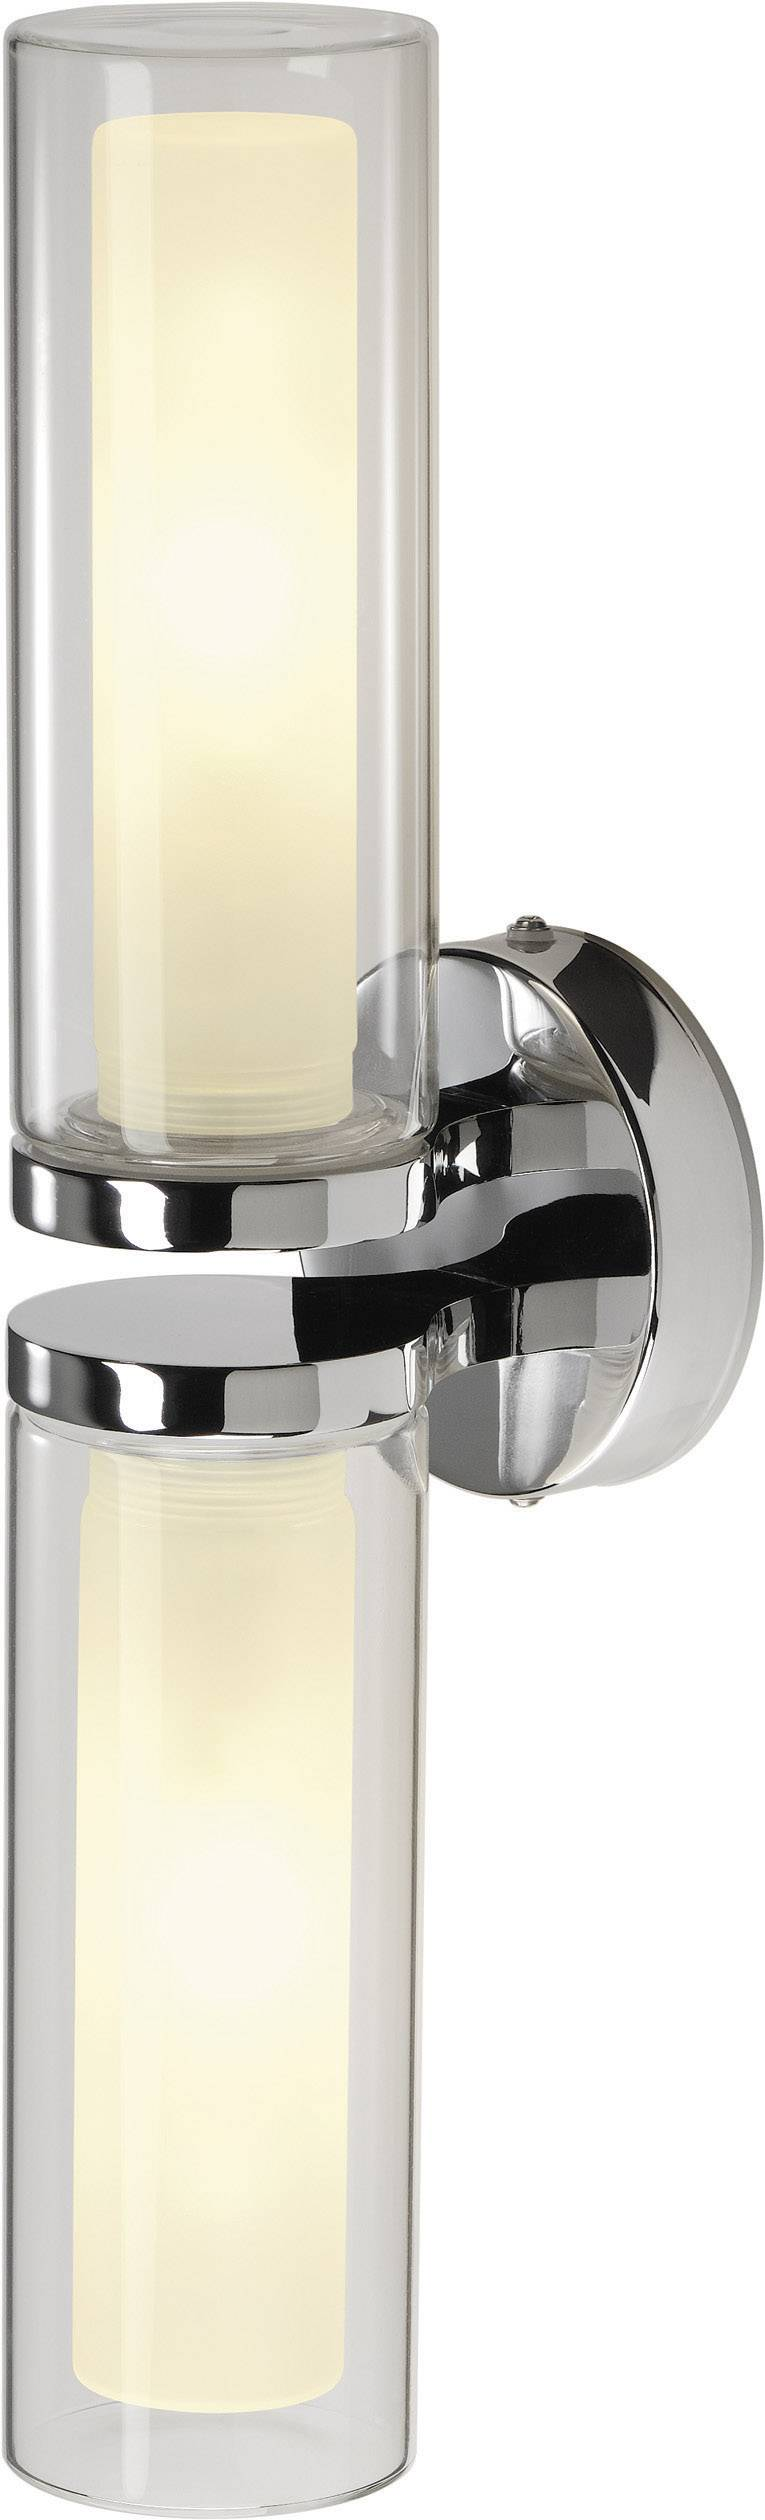 Badkamer Wandlamp Chroom : Badkamer wandlamp ruime keuze muurlampen